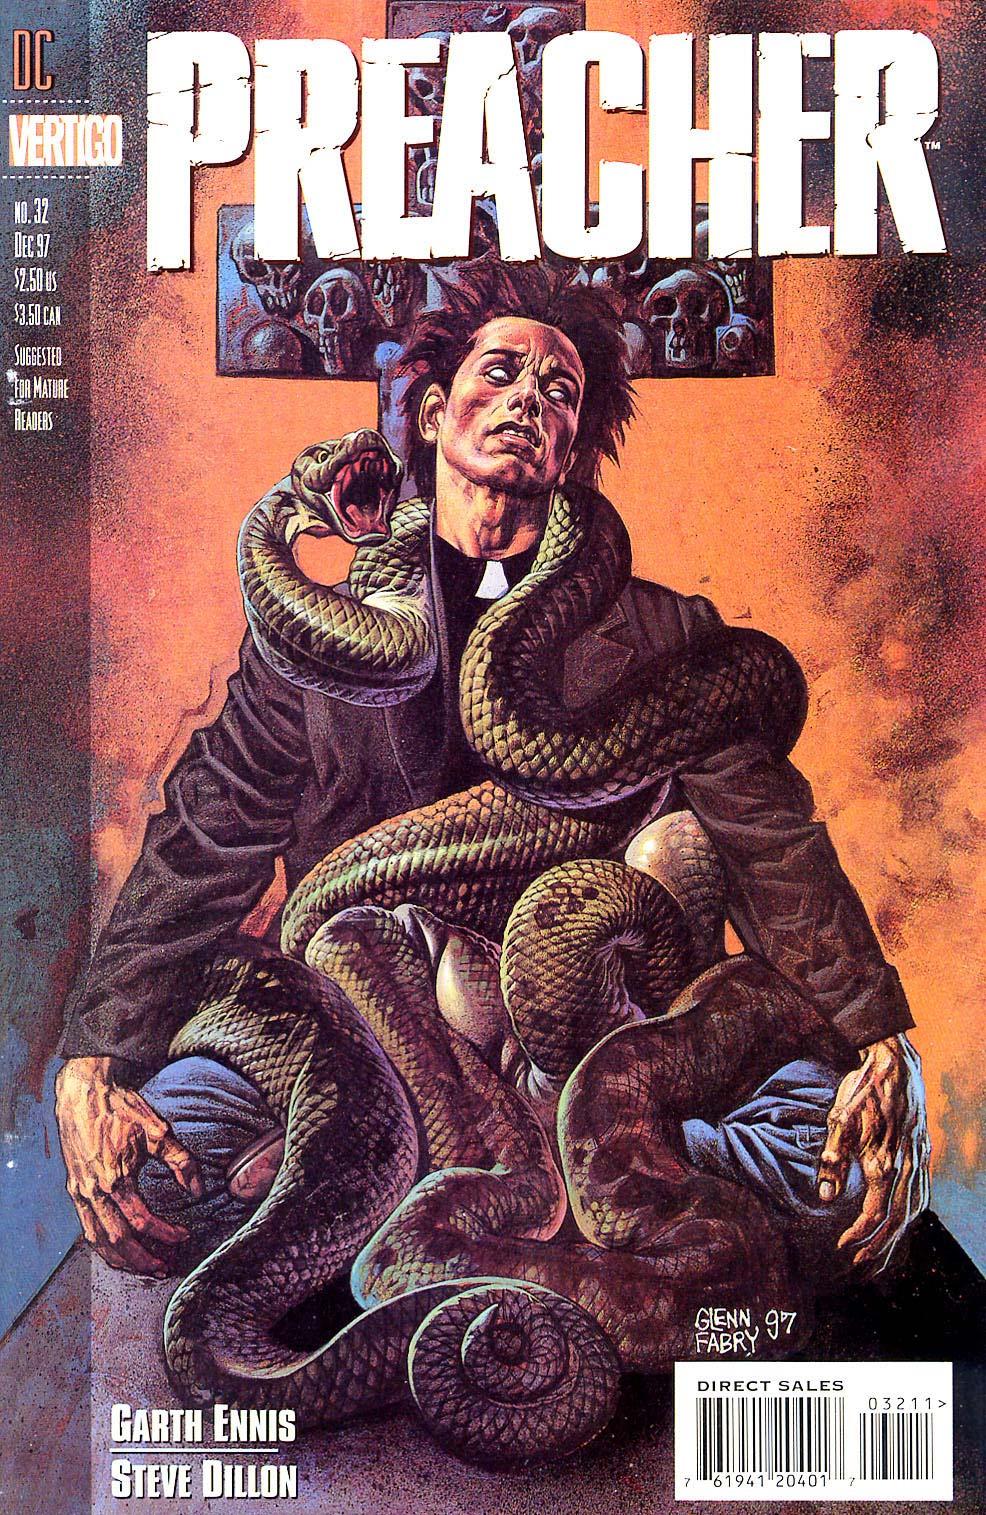 Комиксы Онлайн - Проповедник - # 32 - Страница №1 - Preacher - Preacher # 32